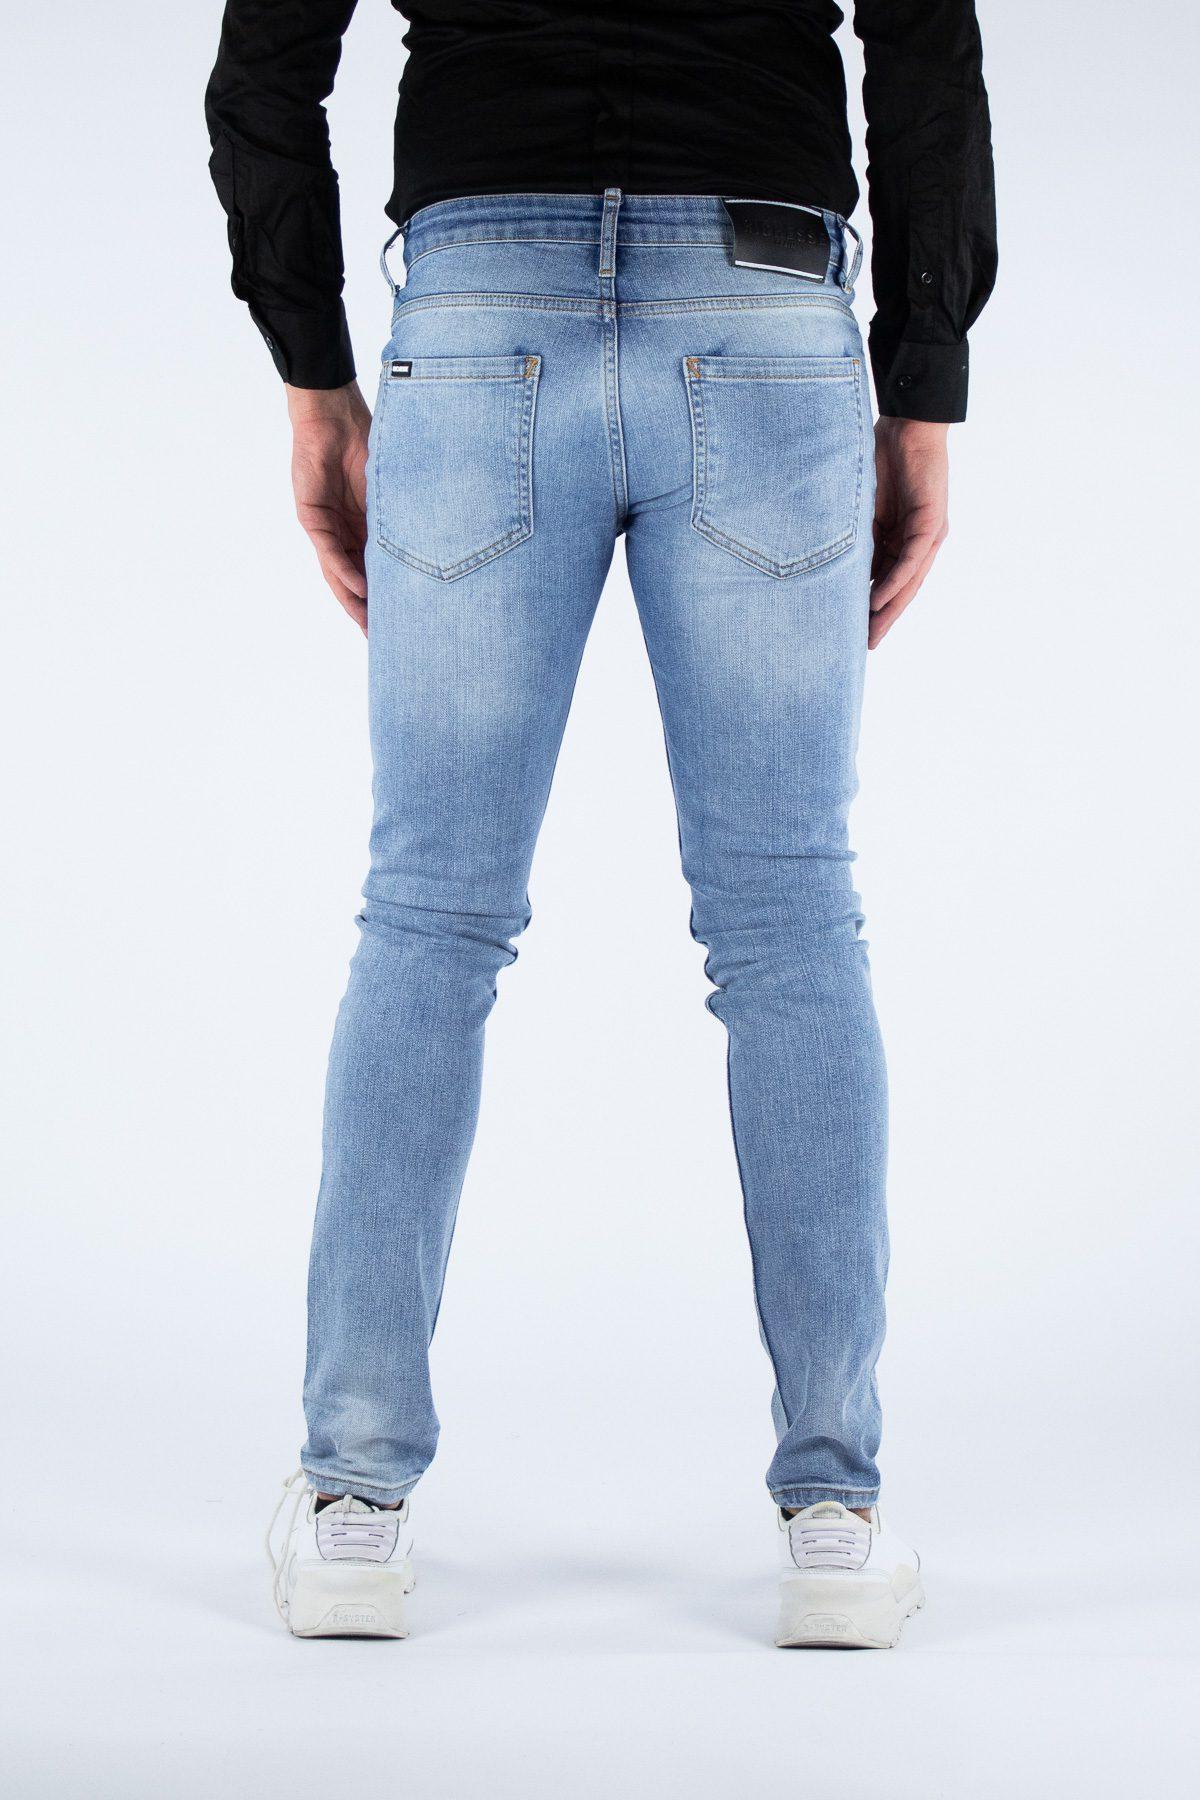 Clarity Light Blue Jeans – 2241-6-4